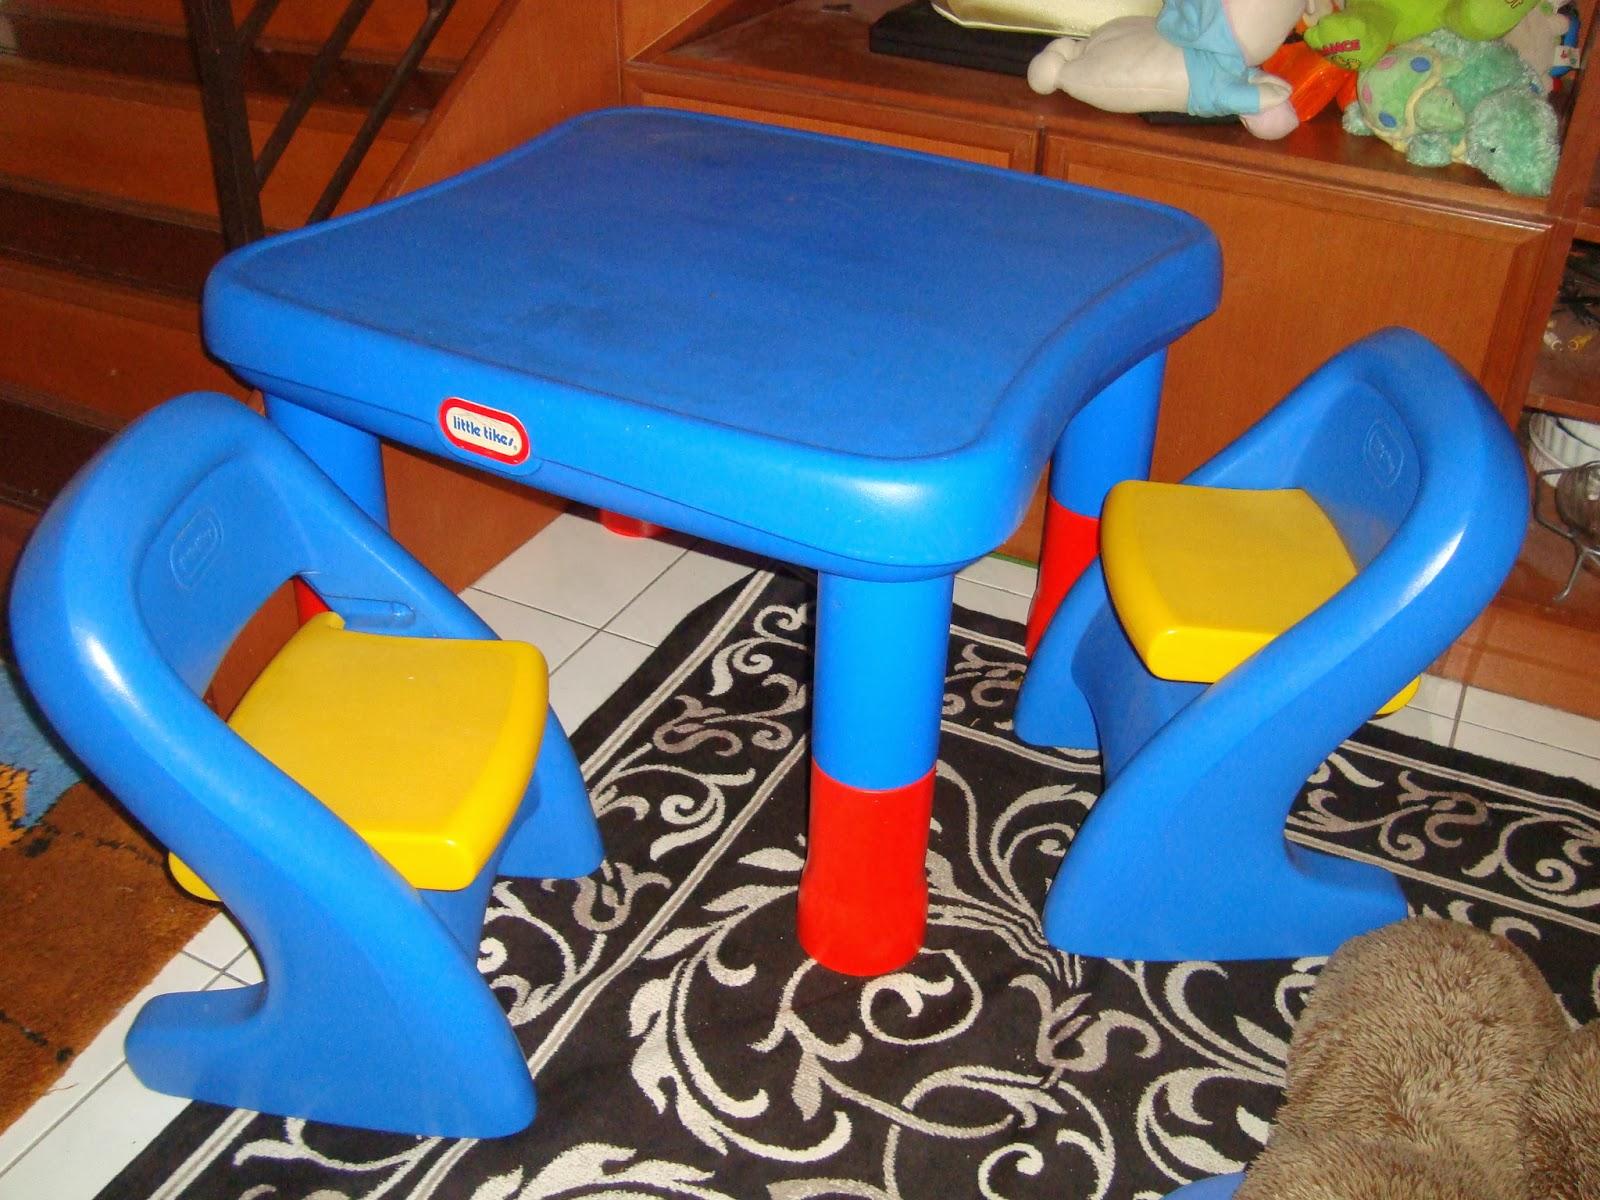 Little Tikes 7749 Adjustable Table \u0026 Chairs Set & Preloved ToysWorld TheTotToys: Little Tikes 7749 Adjustable Table ...